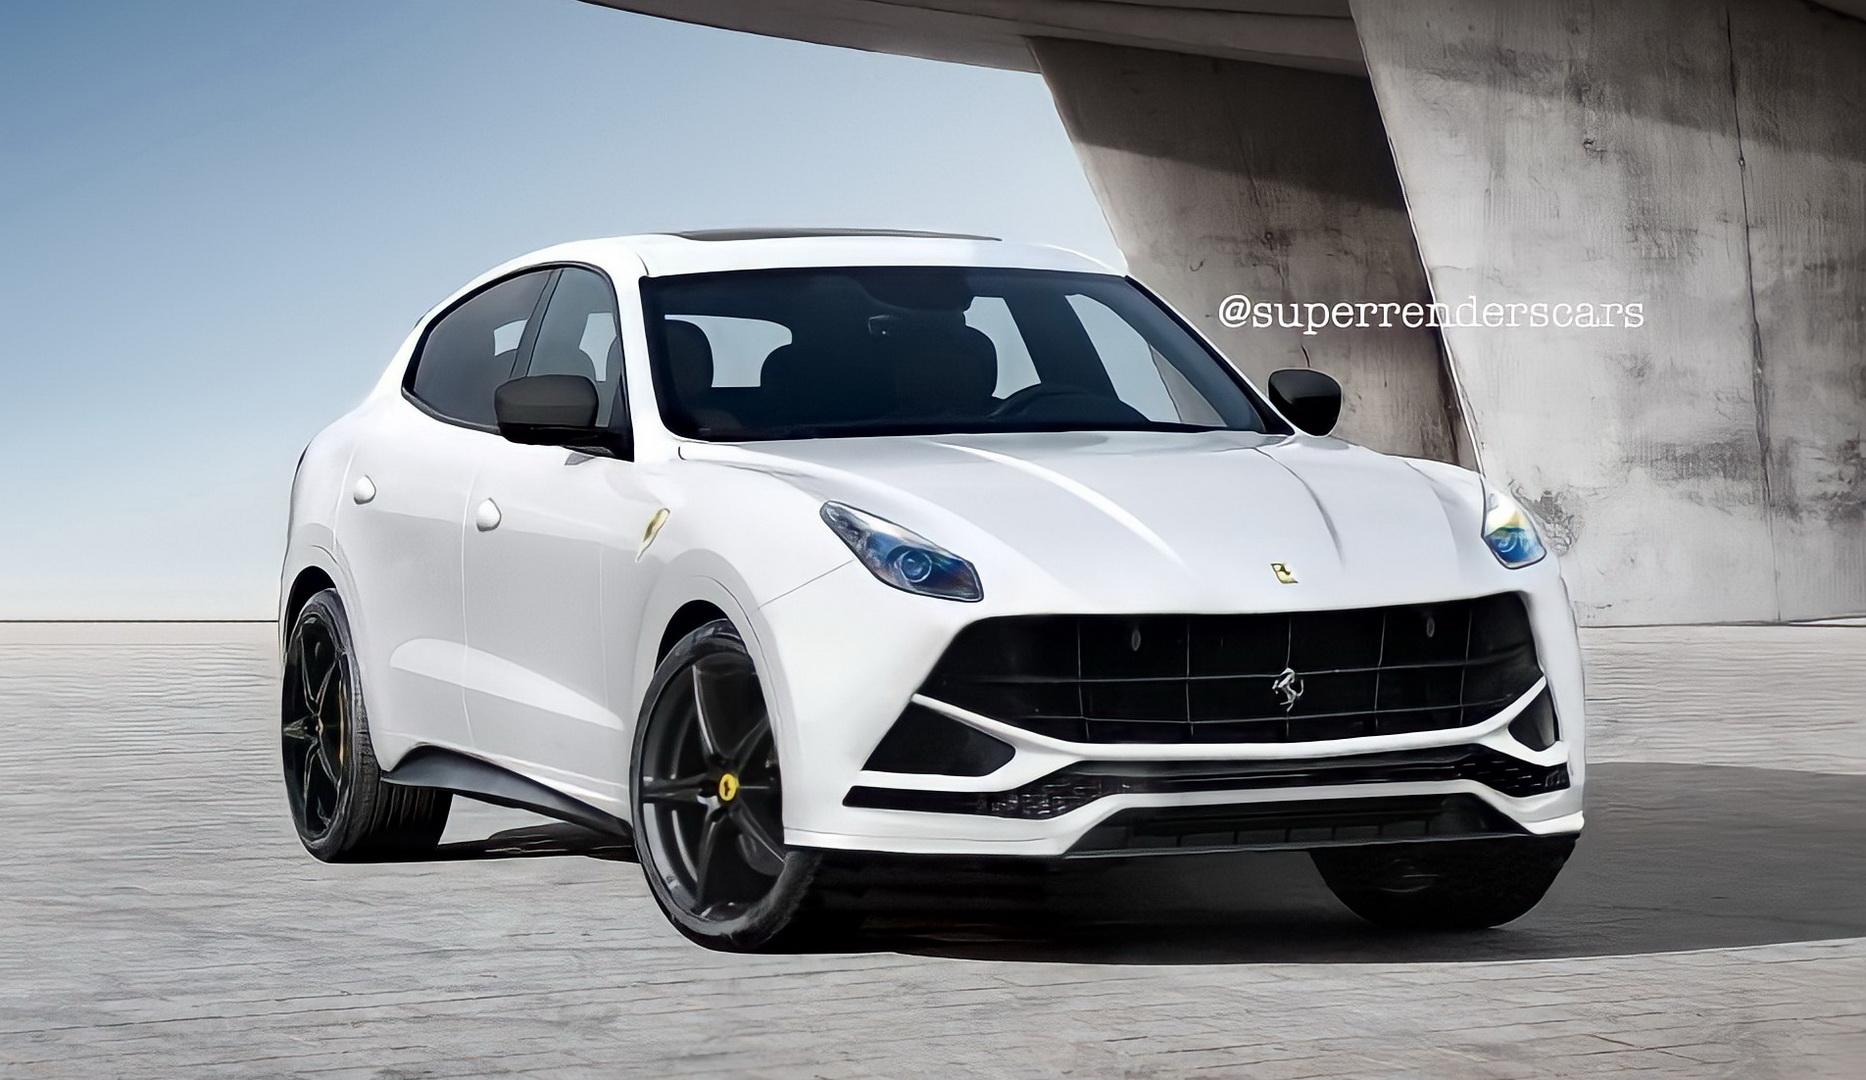 2022 Ferrari Purosangue Suv Will Take The Urus Lunch Money And Here S Why Autoevolution